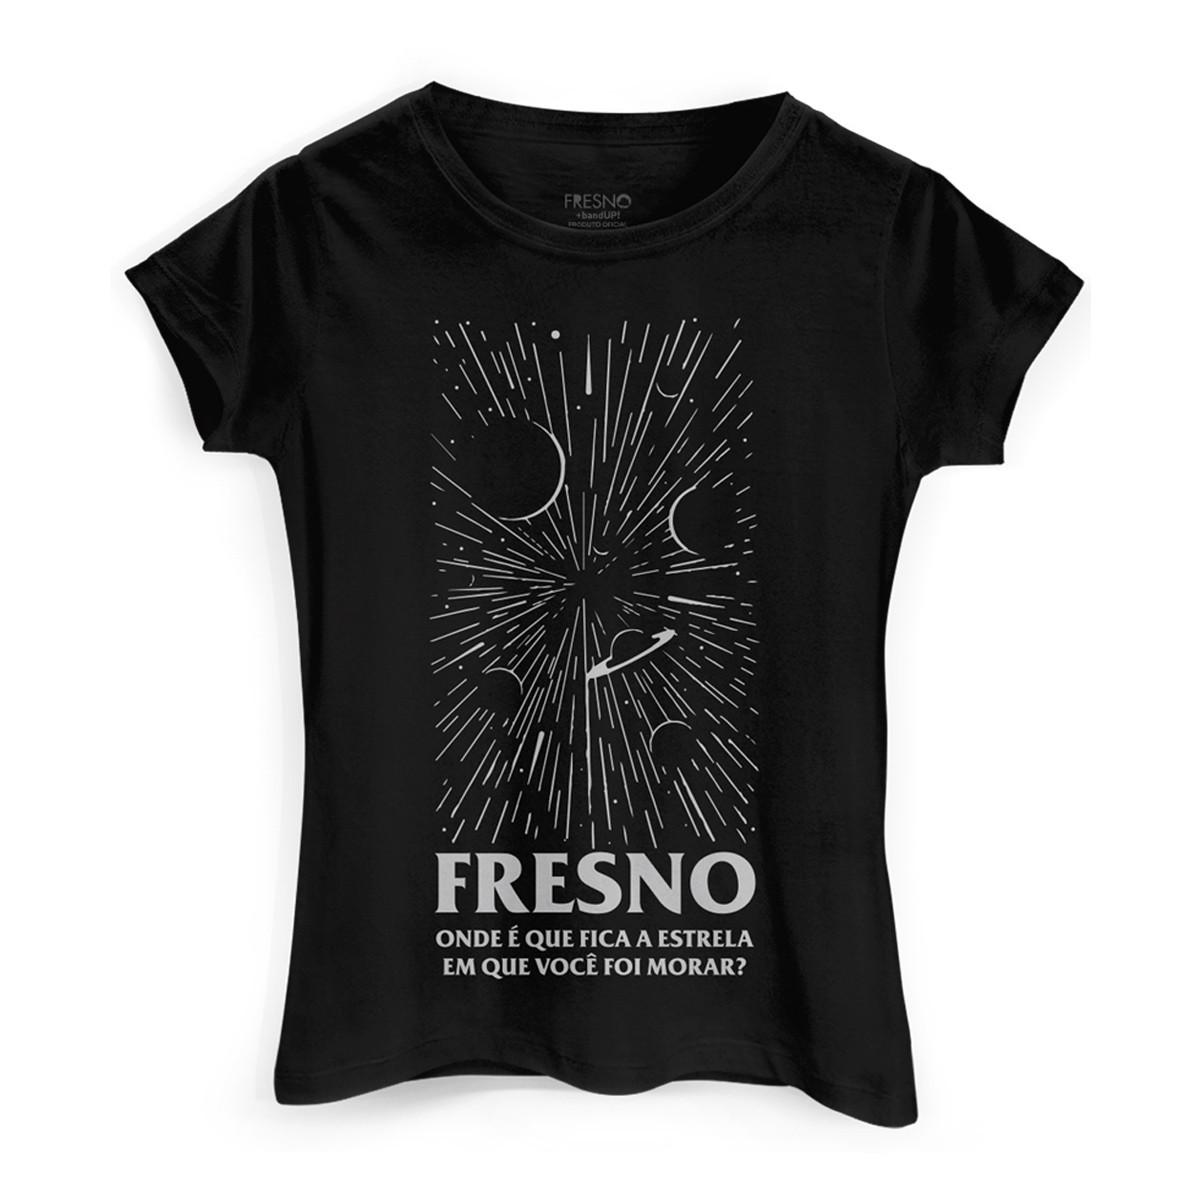 Camiseta Feminina Fresno Onde Fica a Estrela